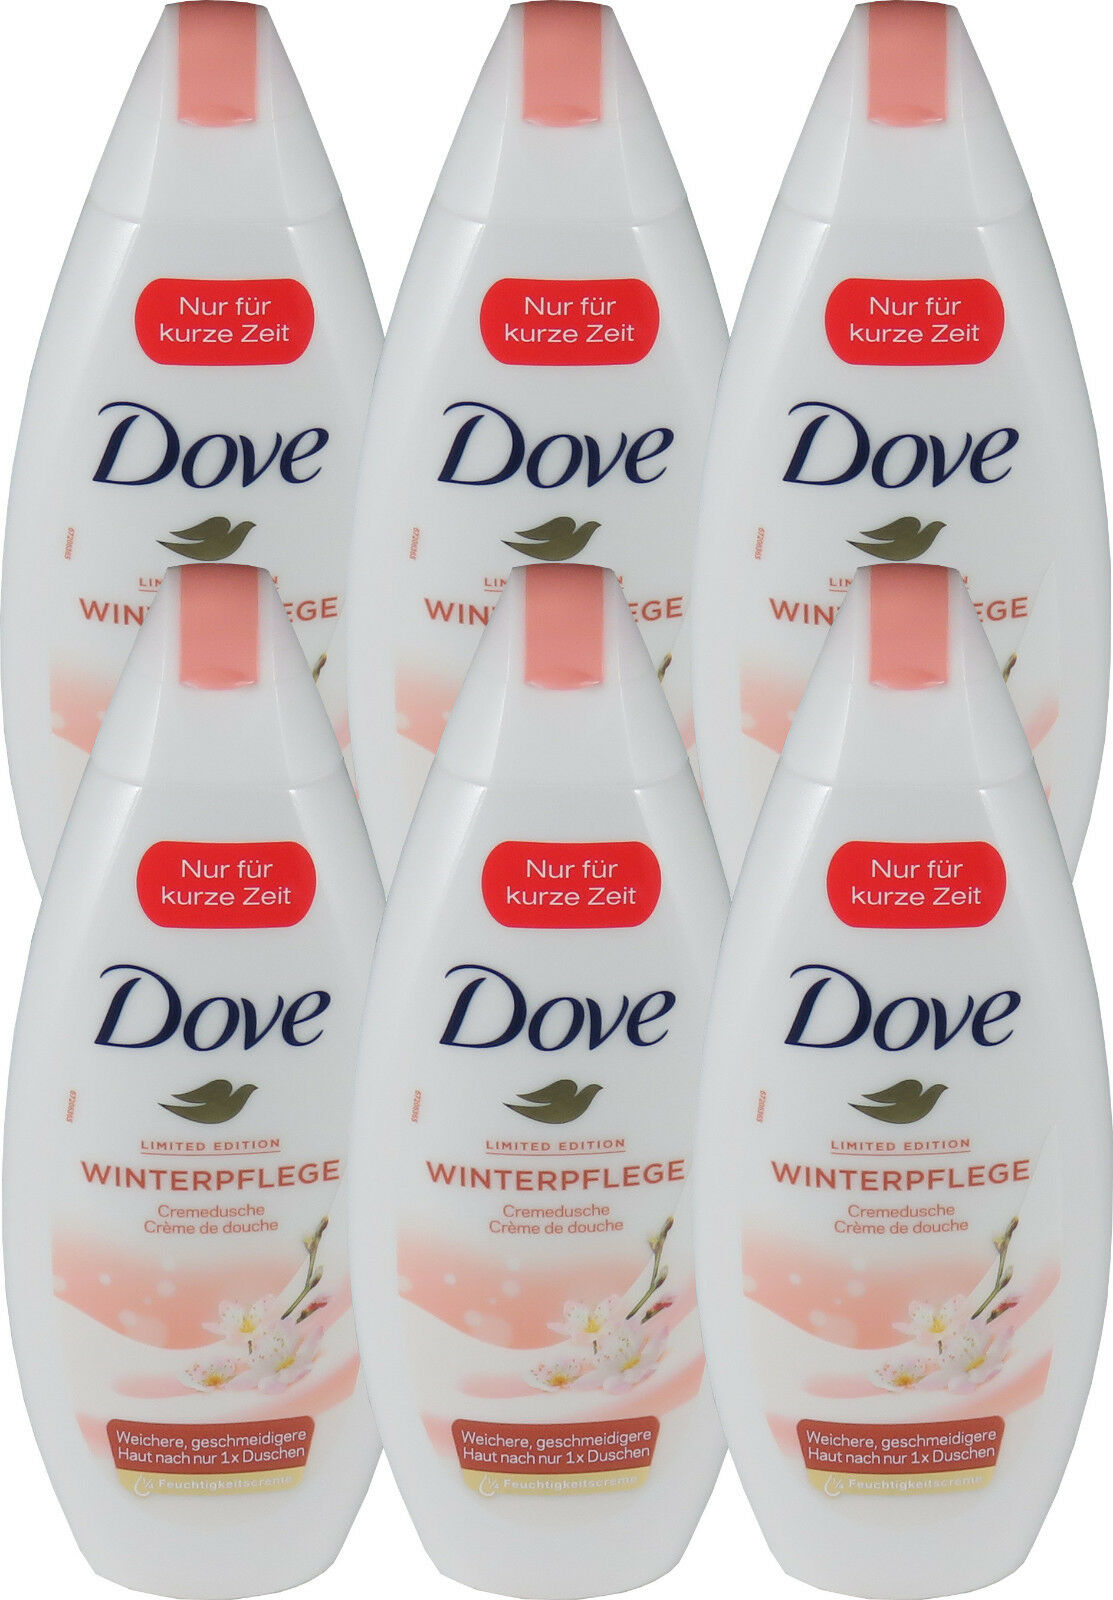 6 x 250 ml Dove Duschgel Limited Edition Winterpflege Cremedusche